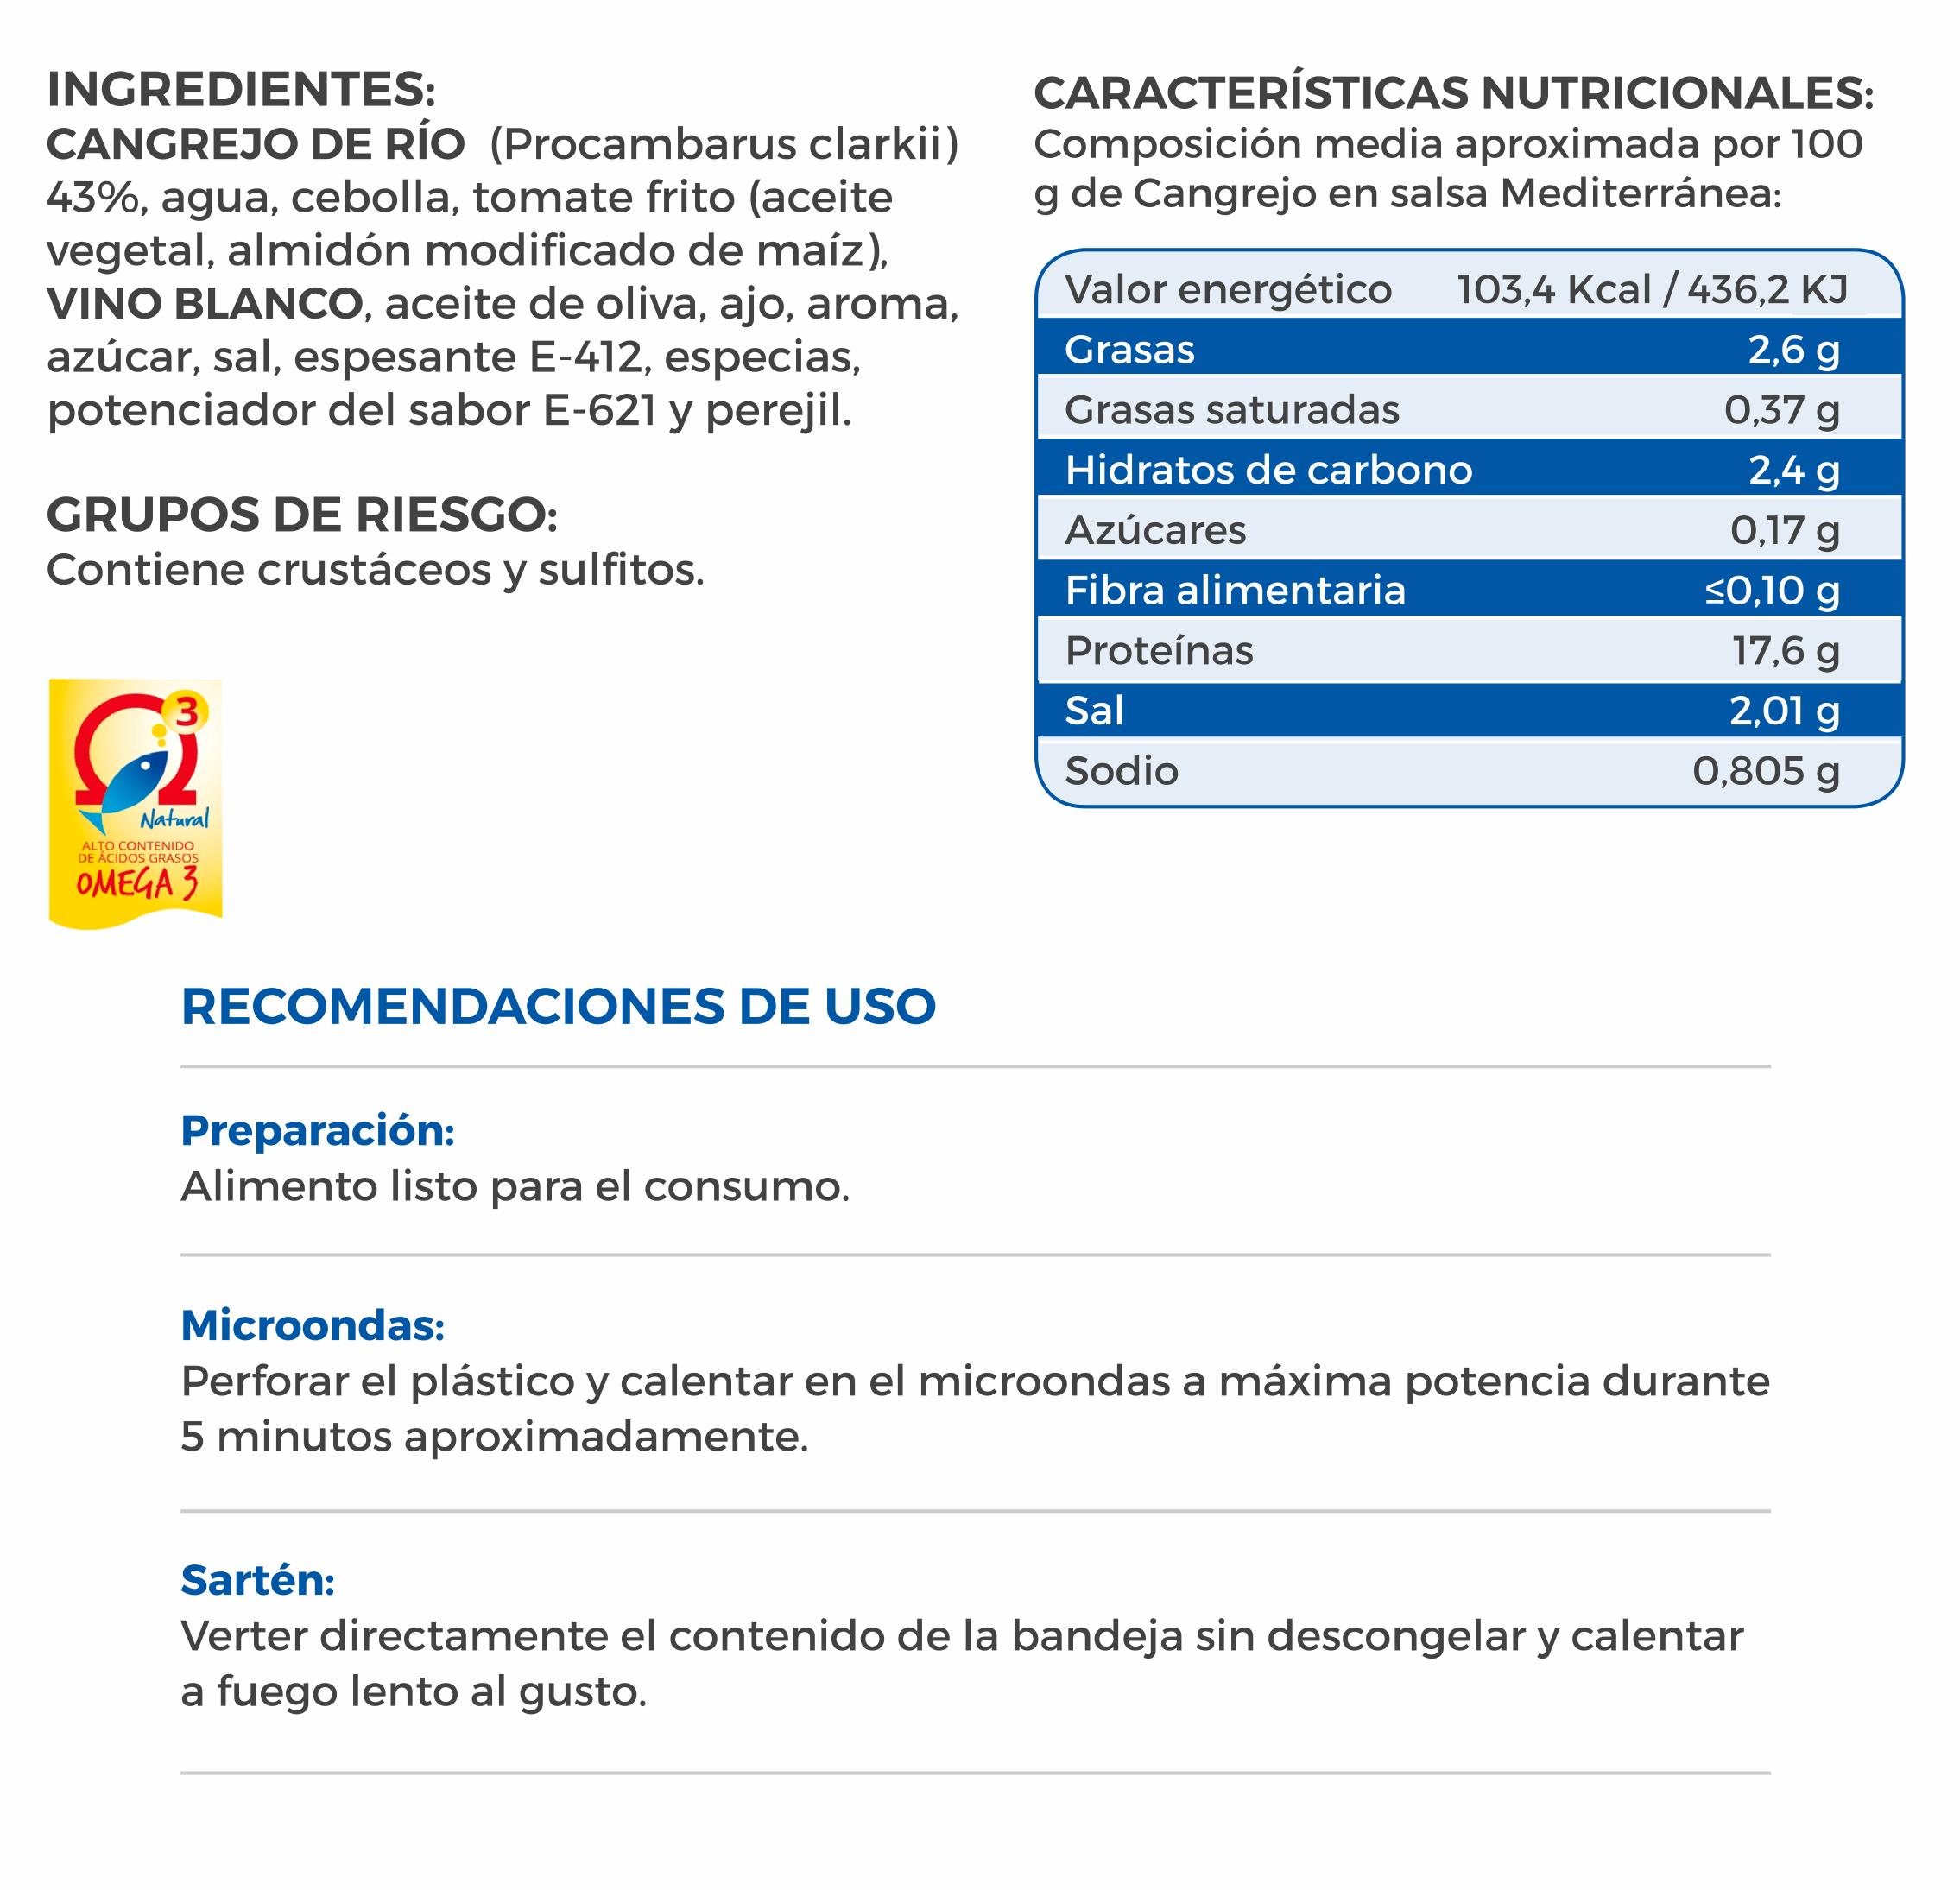 05-cangrejo-de-rio-en-salsa-mediterranea-03-2019